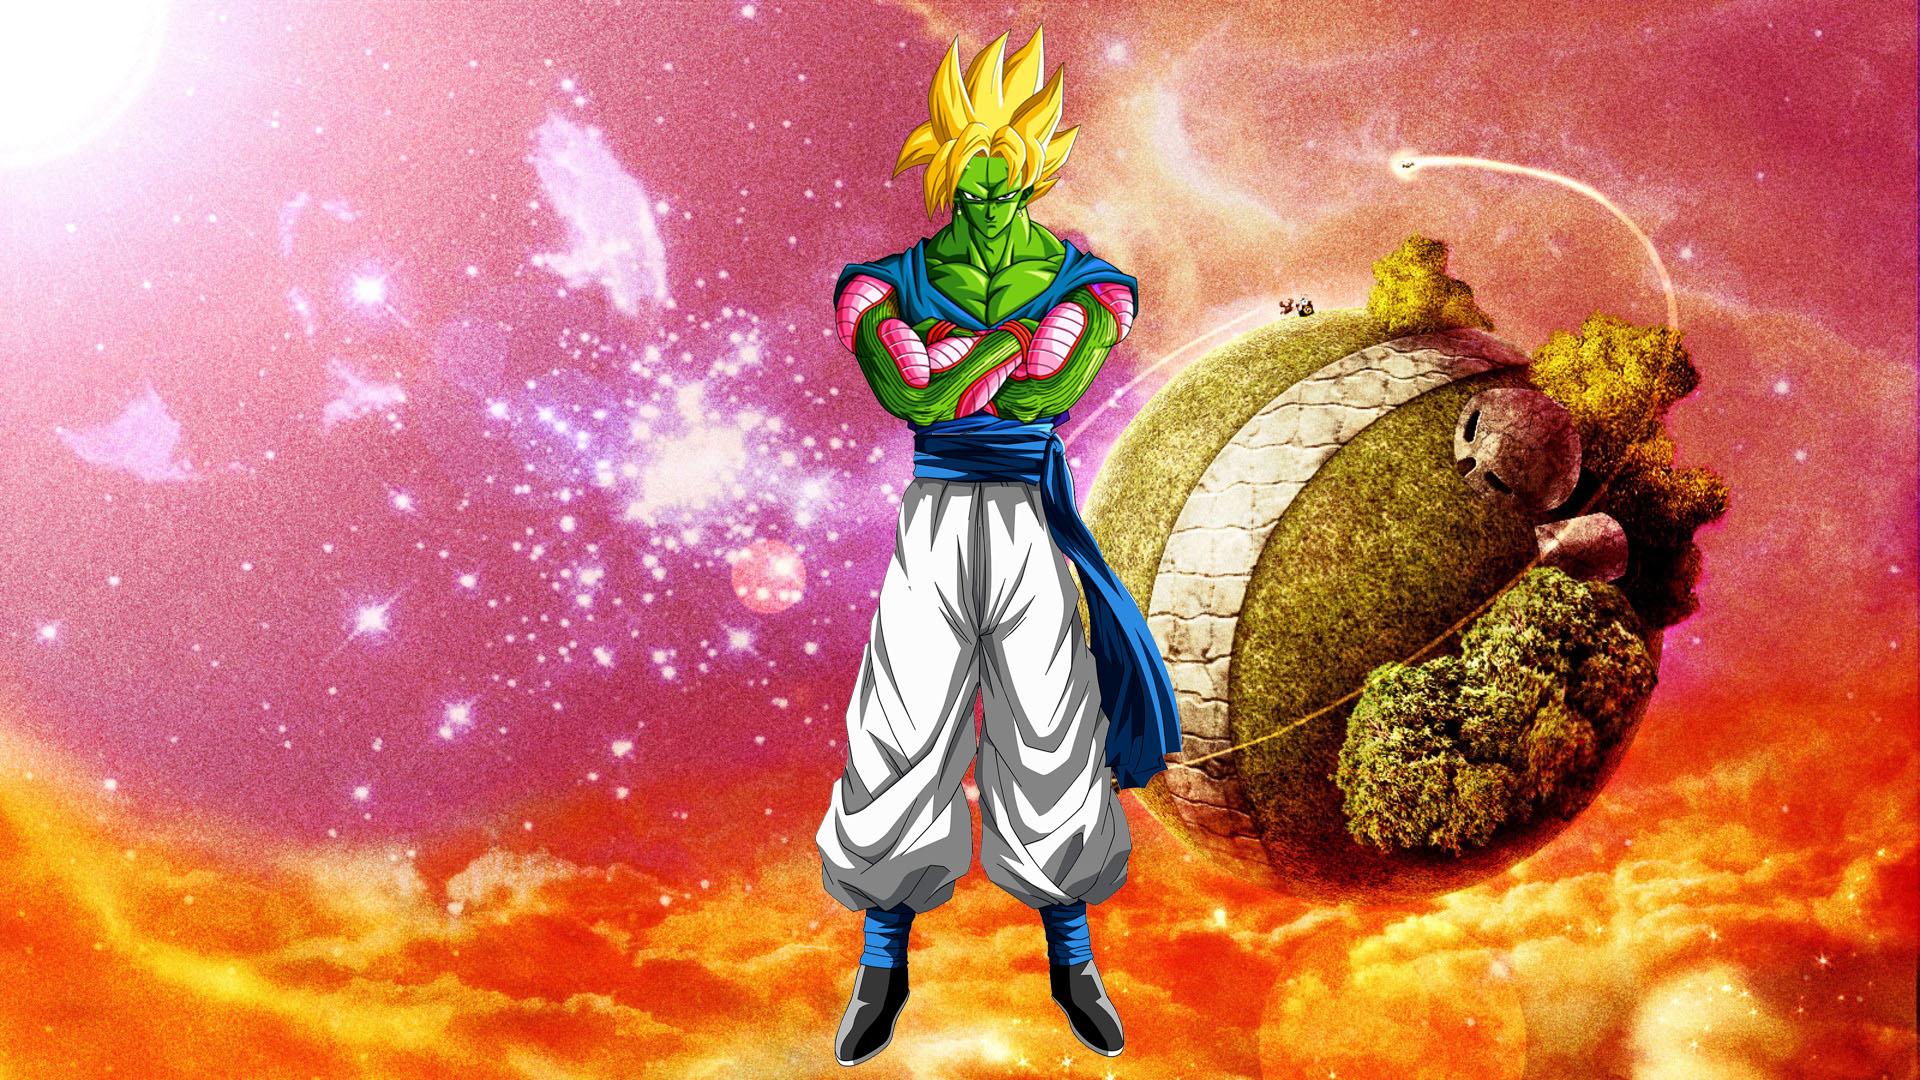 Dragonball Goku Piccolo Fusion Full HD Wallpaper And Background